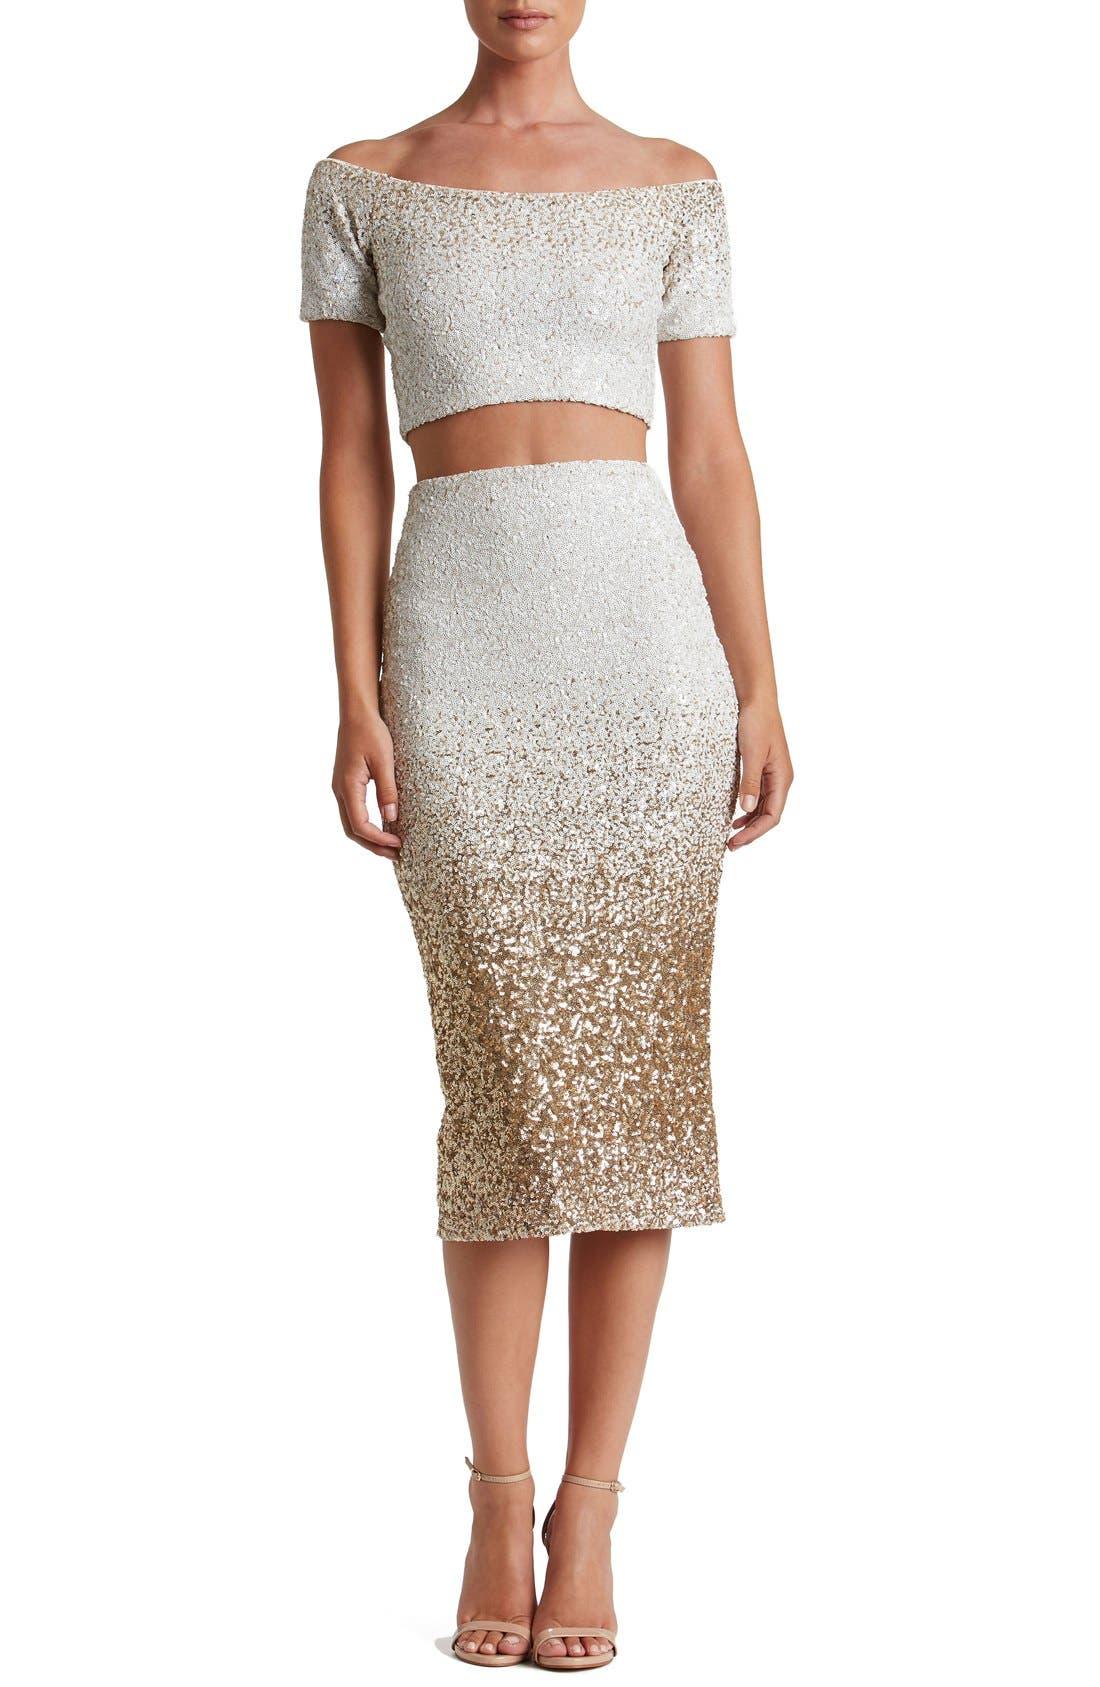 Main Image - Dress the Population Emilia Sequin Two-Piece Dress